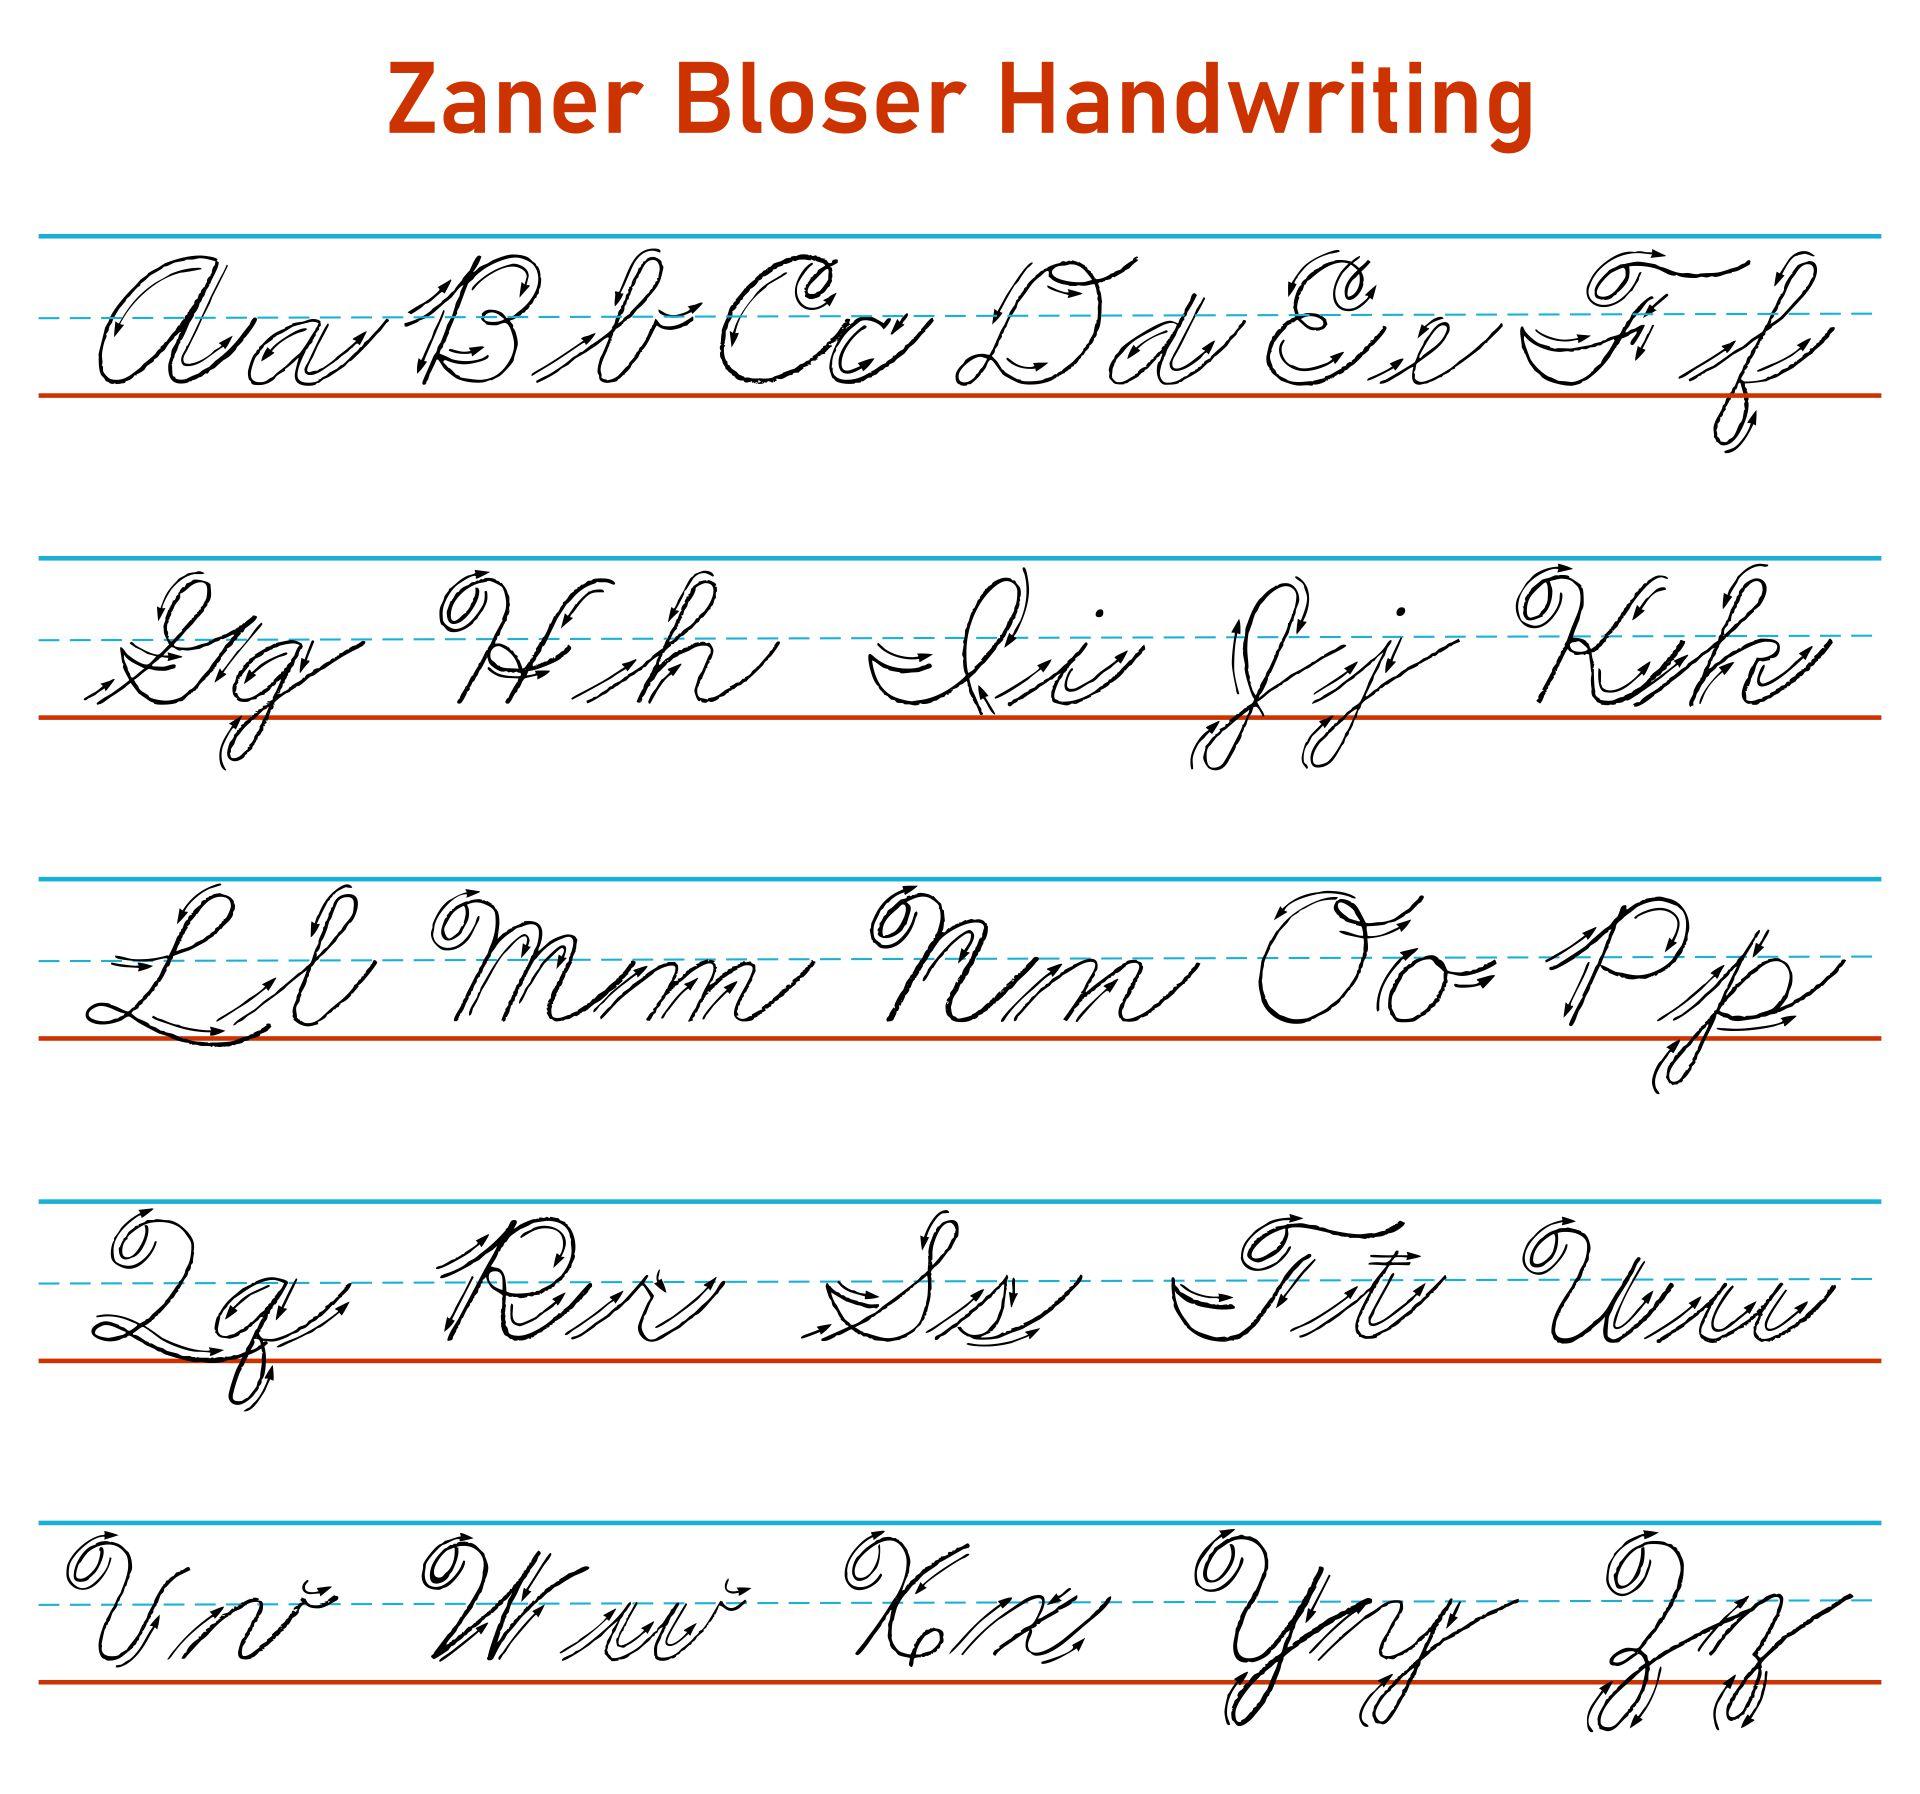 7 Best Images Of Zaner Bloser Handwriting Chart Printable